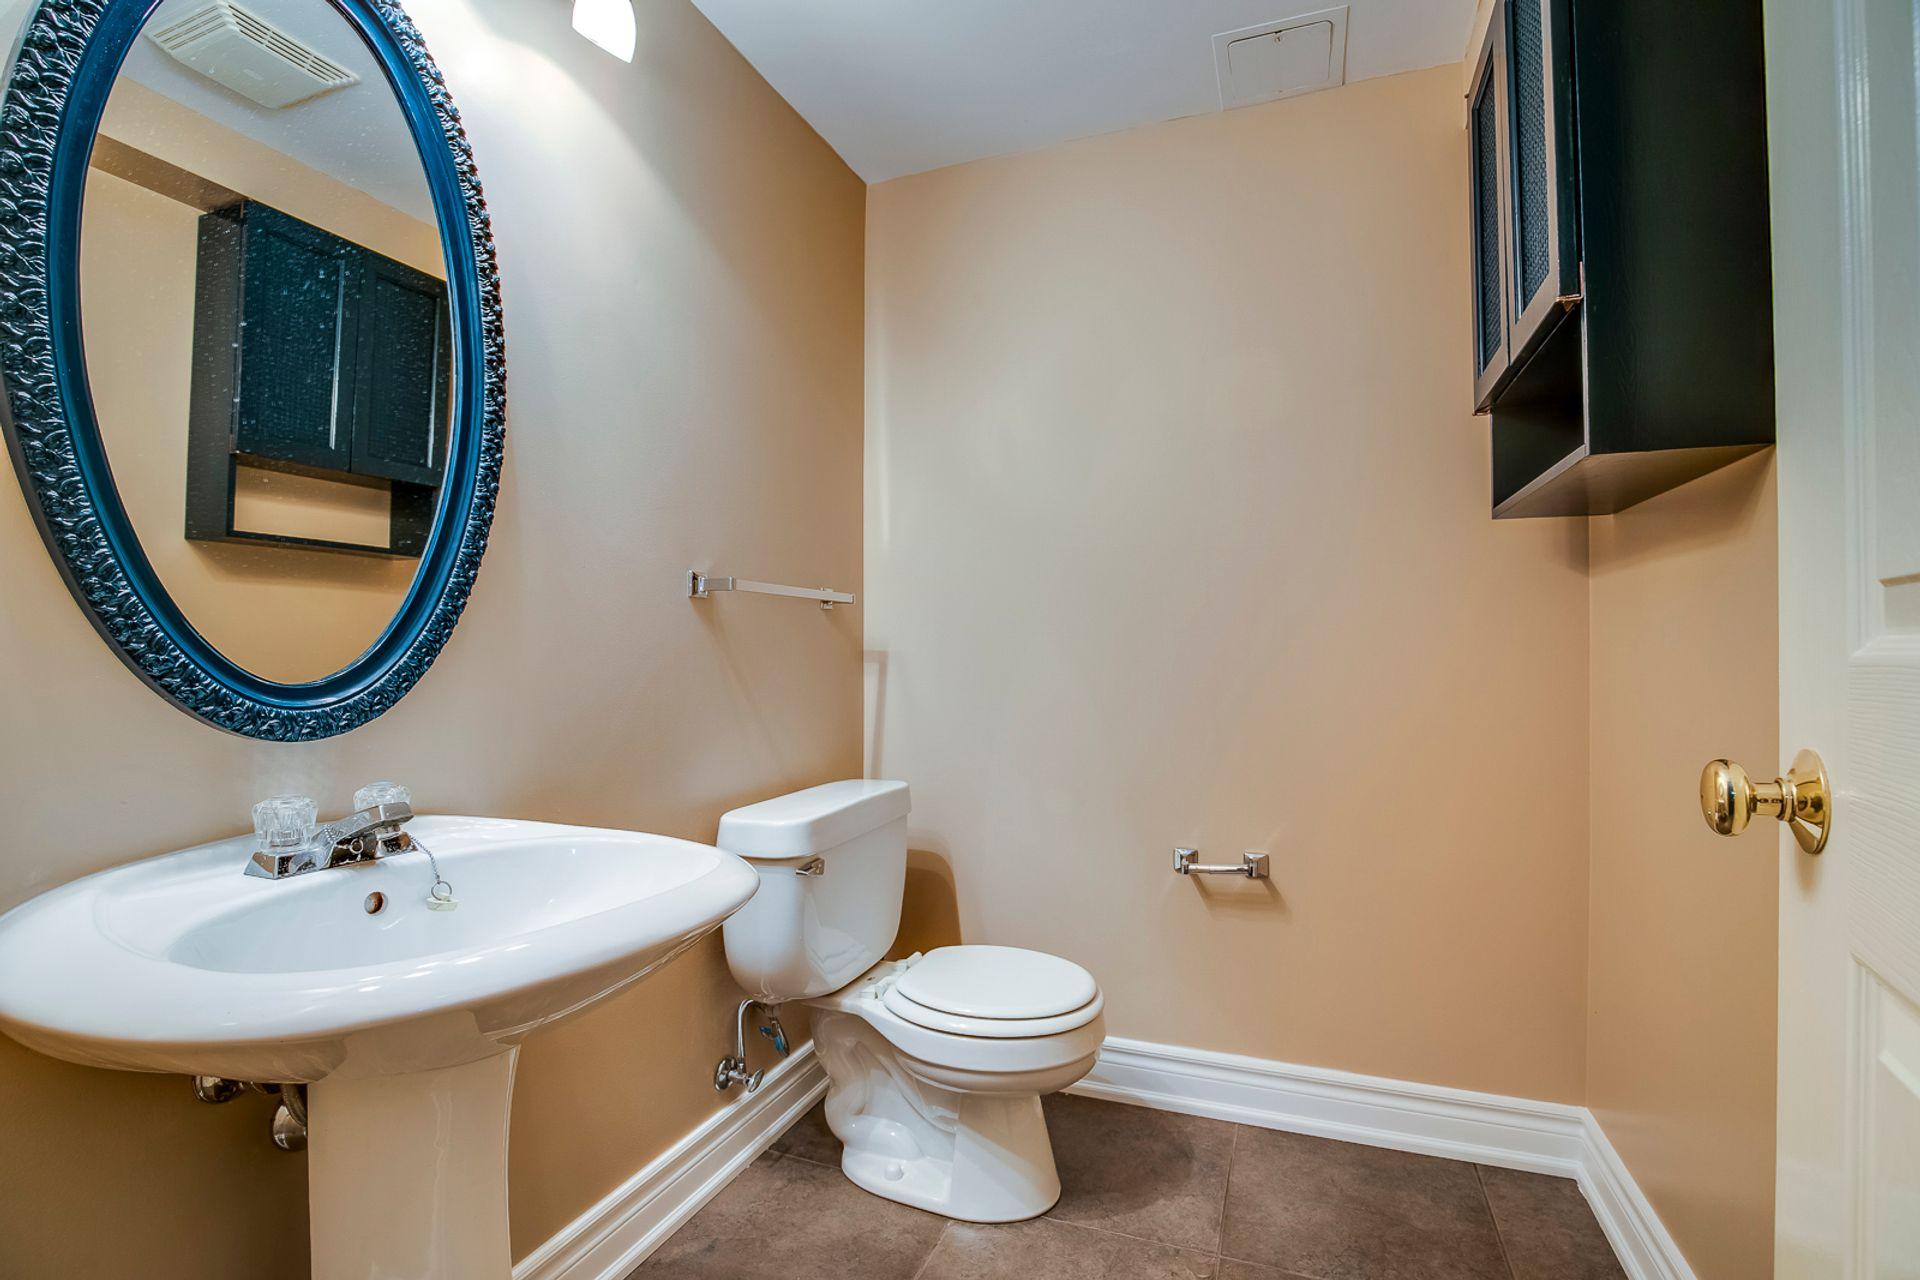 Basement Bathroom - 2180 Dunvegan Ave, Oakville - Elite3 & Team at 2180 Dunvegan Avenue, Eastlake, Oakville